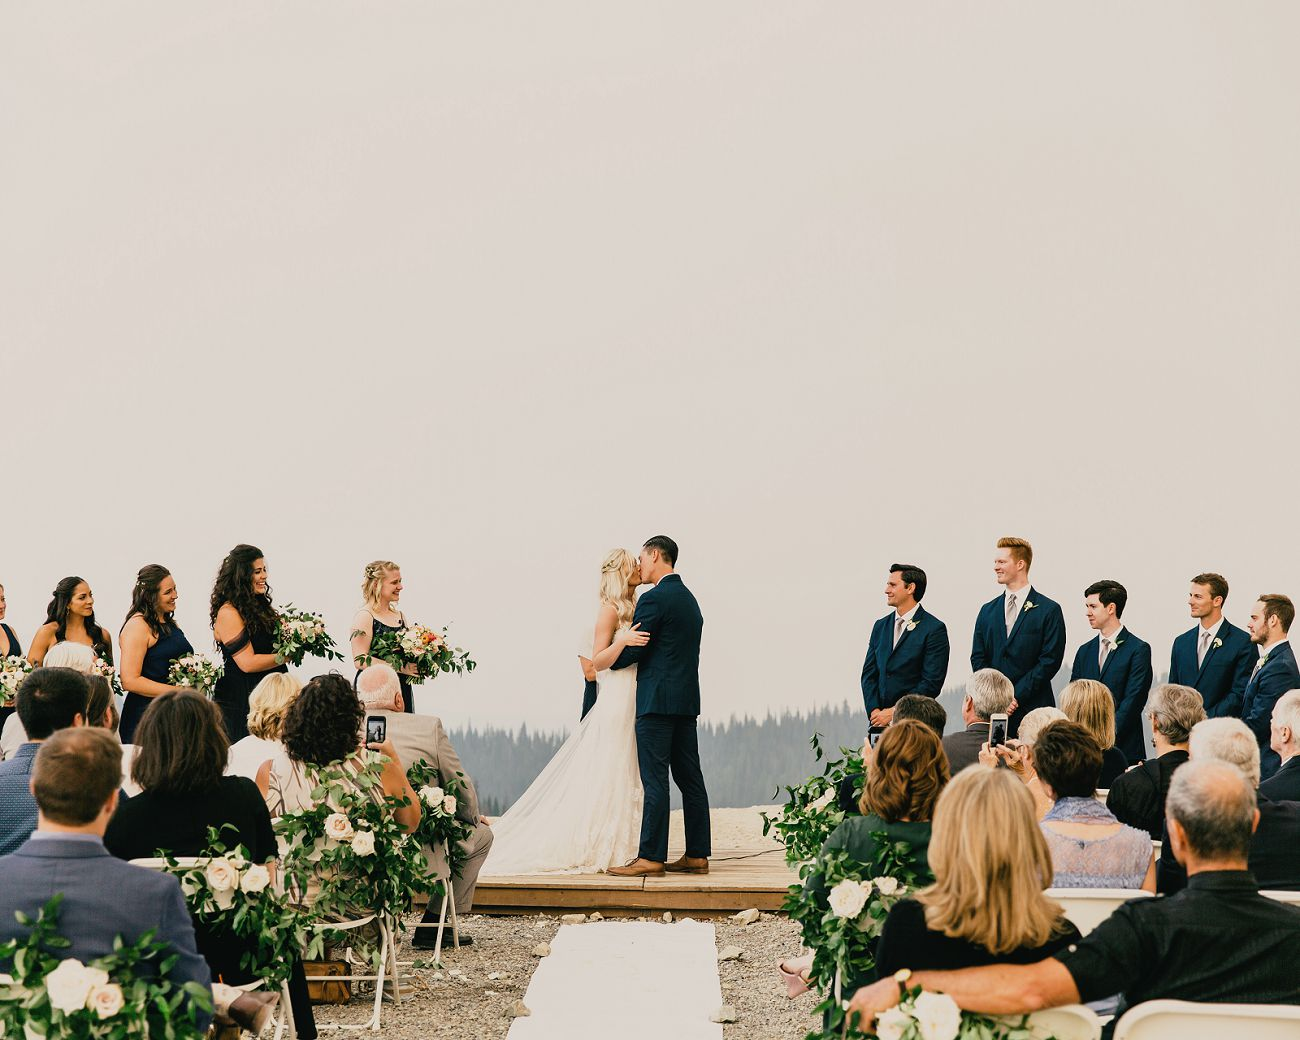 Jennifer_Mooney_Photo_Whitefish_mountain_resort_wedding_elegant_montana_wedding_012.jpg